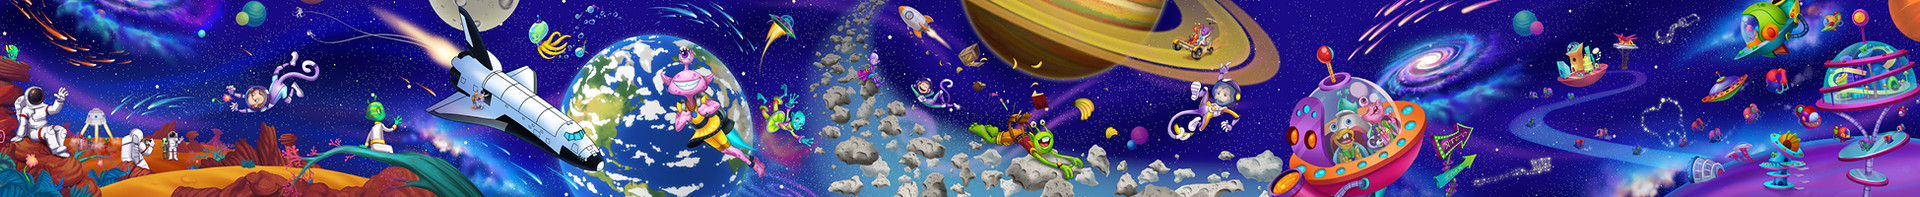 KIDS SPACE-1